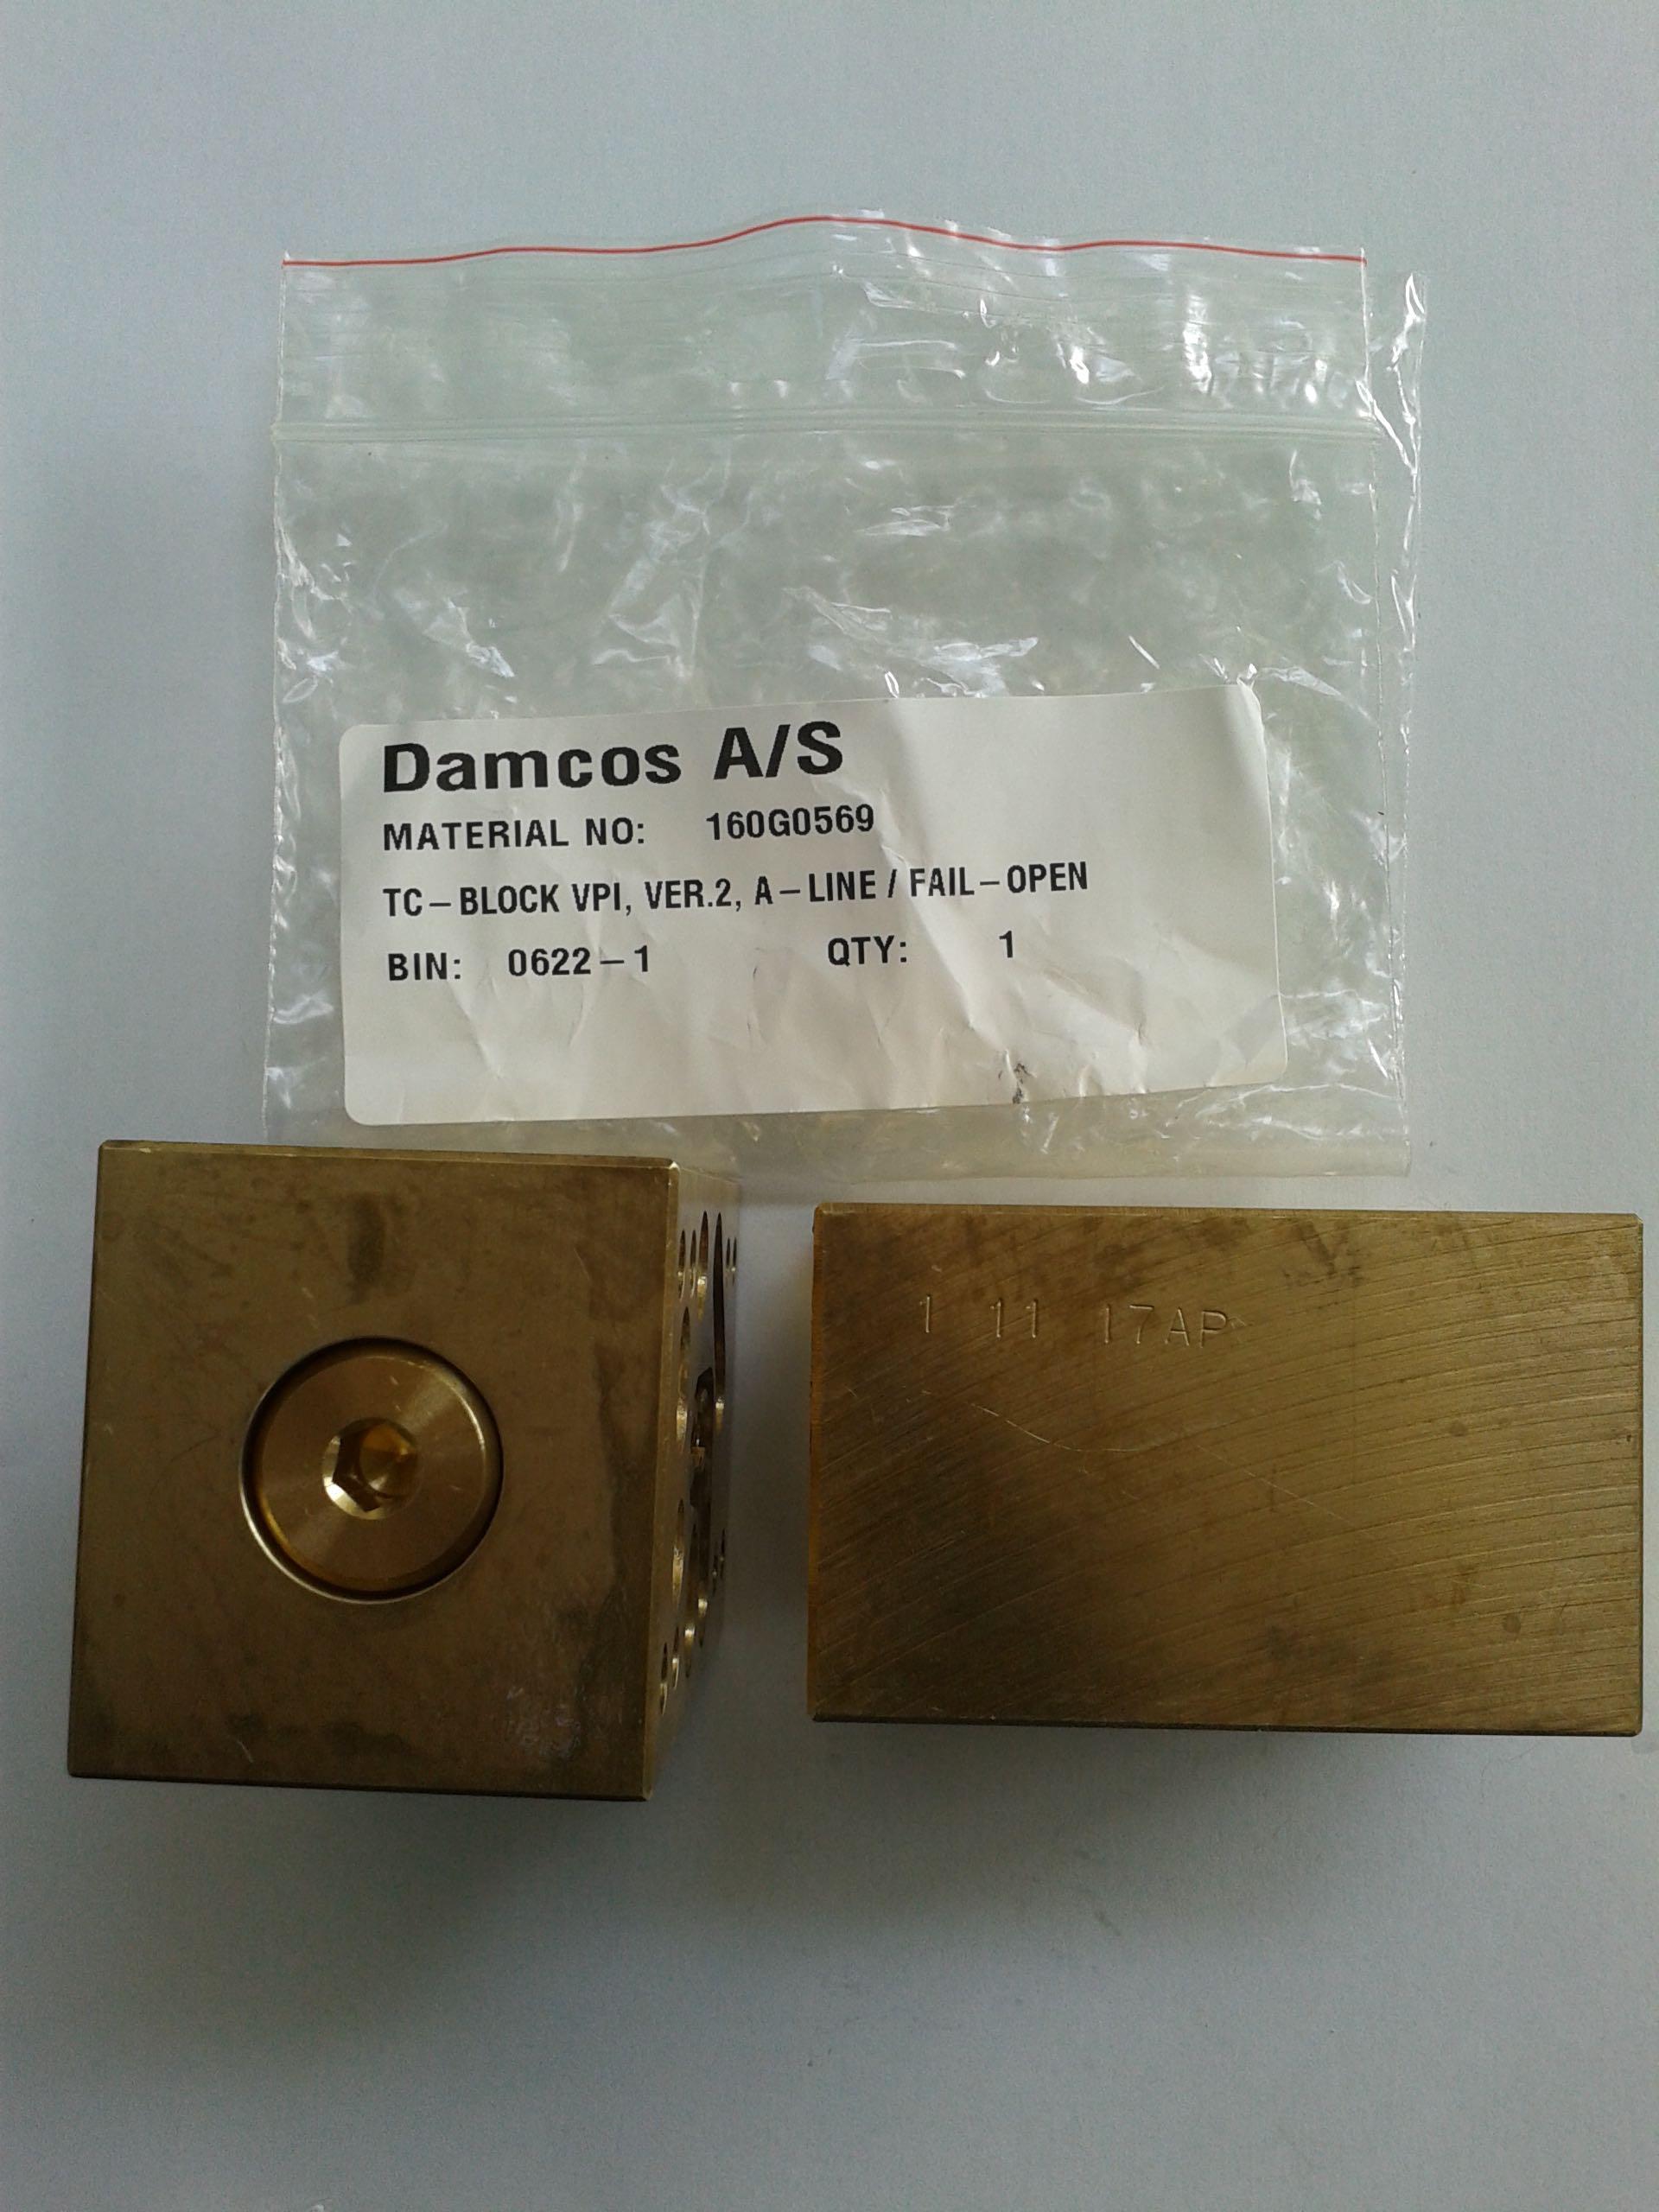 Damcos : Danfoss VPI-TC v2a FO Control Block 160G0569